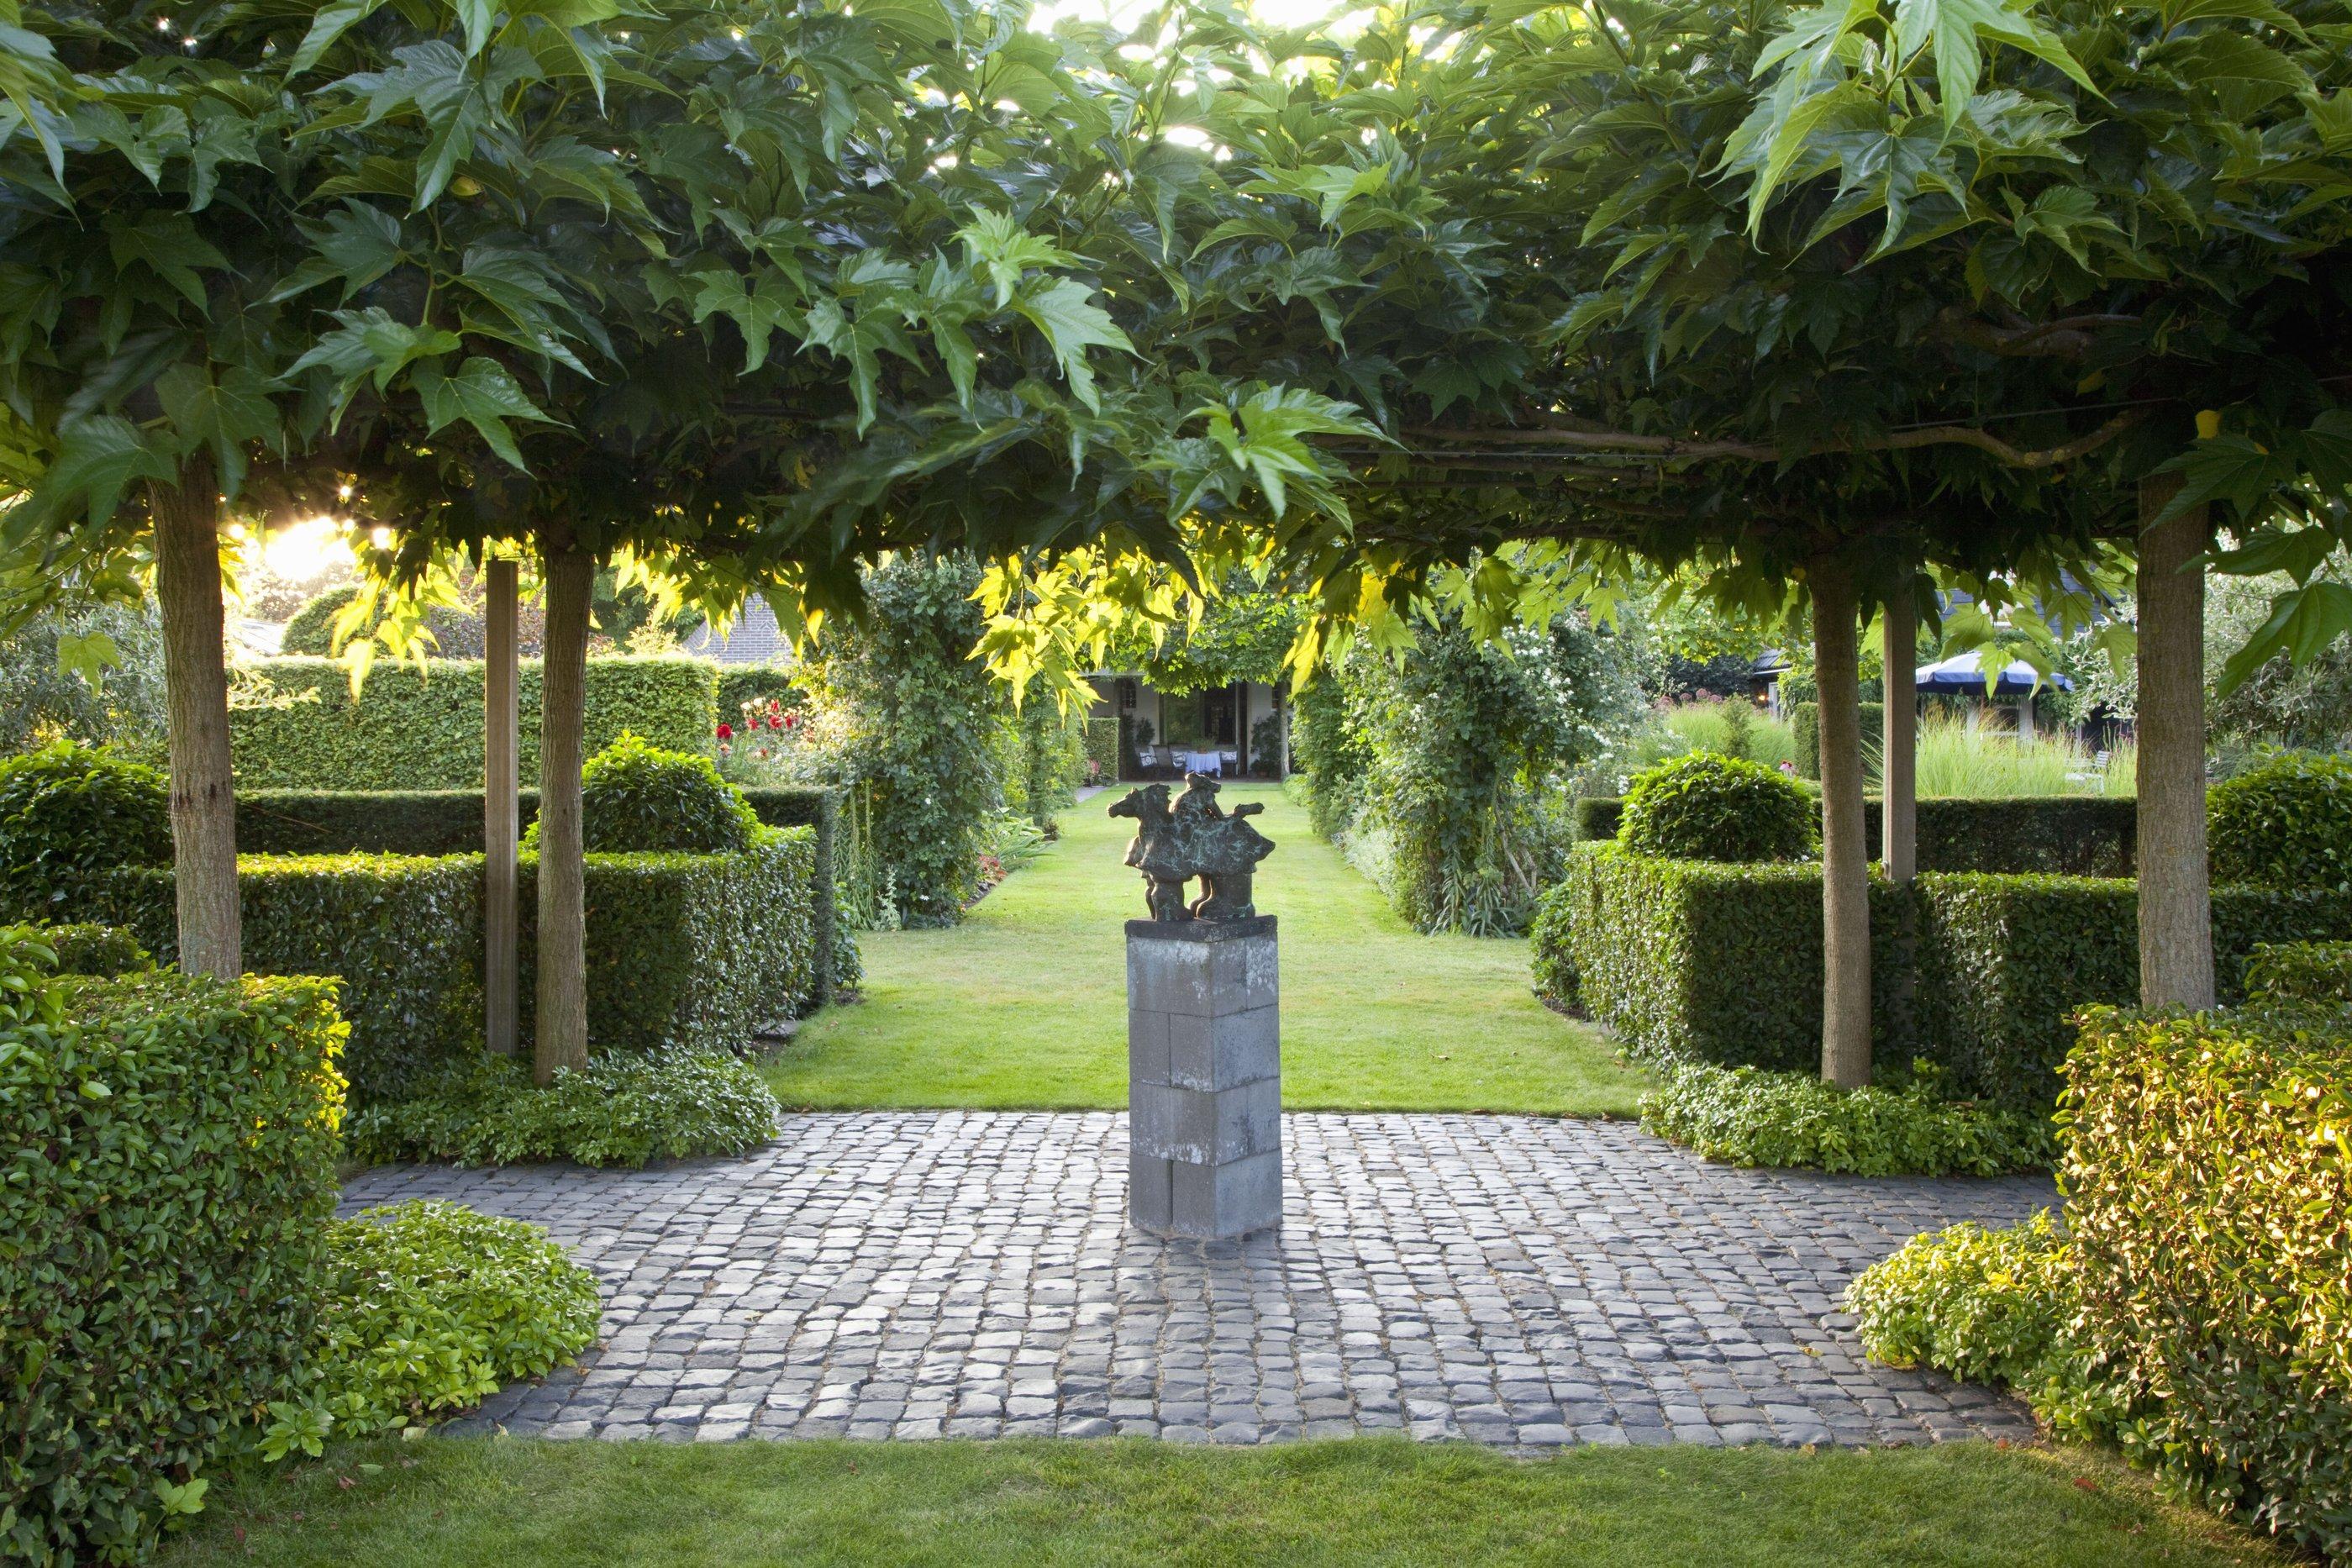 28619-prunus-lusitanica-portuguese-laurel-hedge-modern-garden.jpg